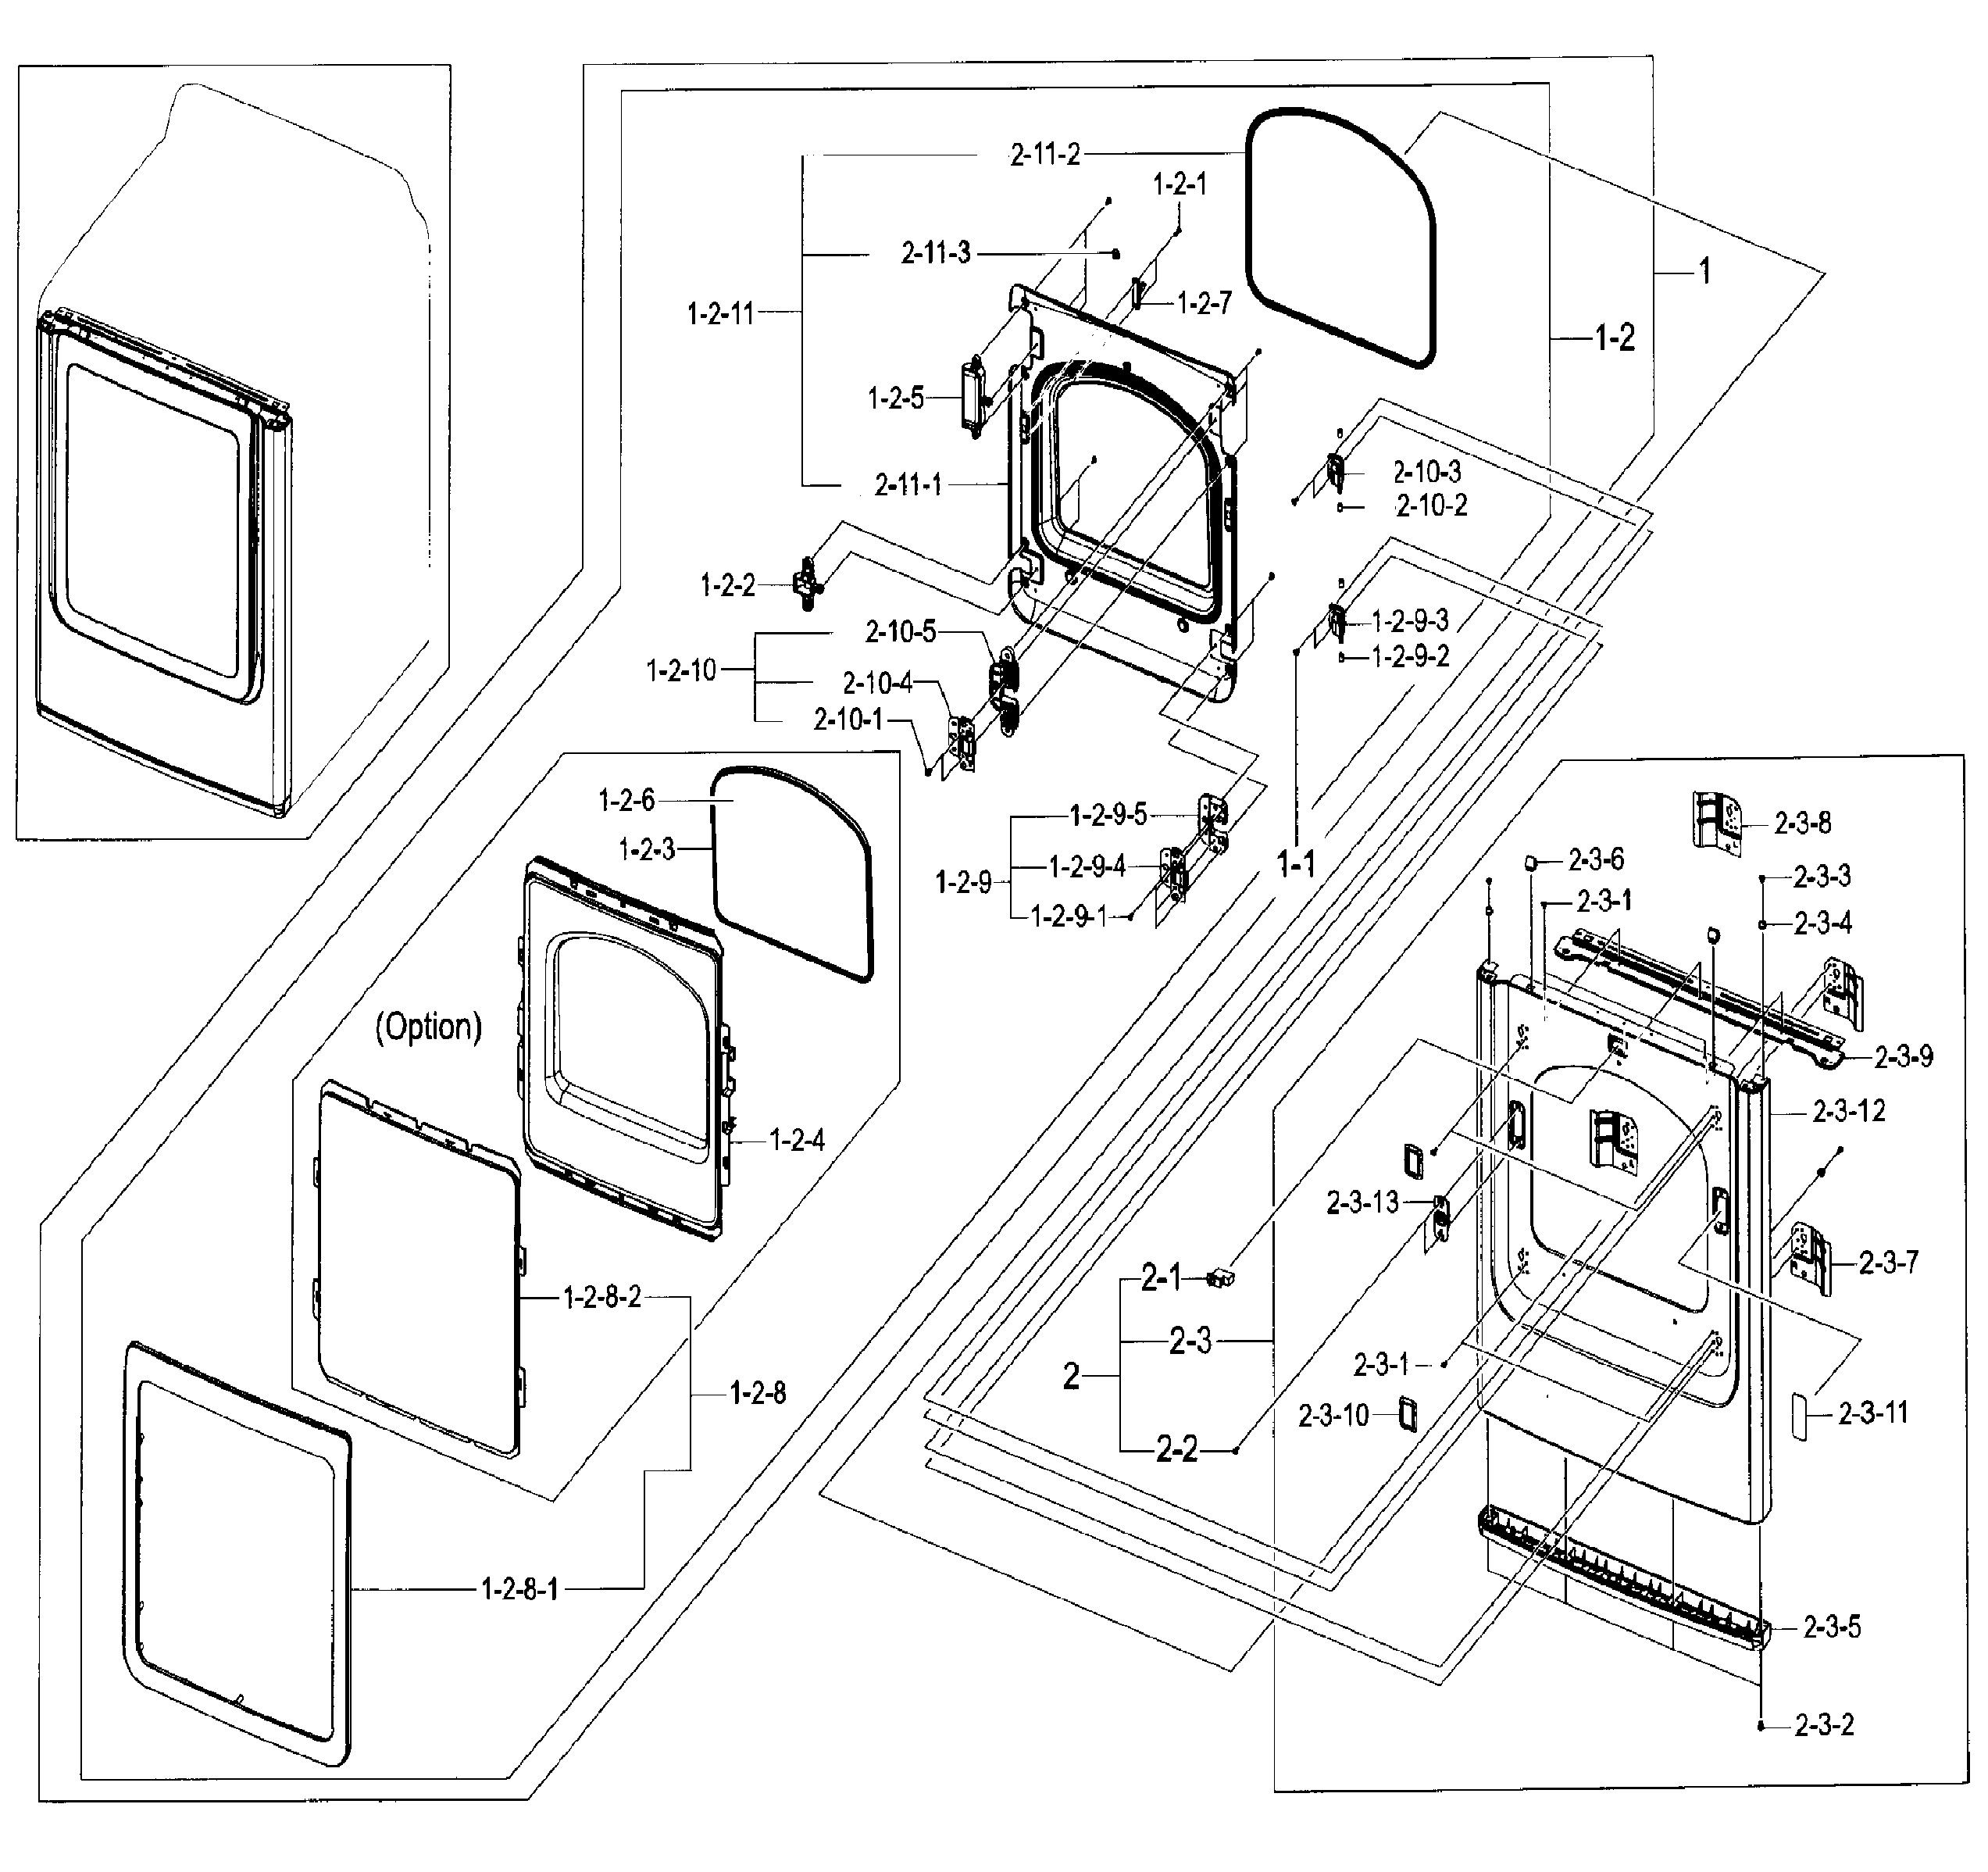 Frigidaire Dryer Parts Diagram In 2021 Diagram Frigidaire House Wiring